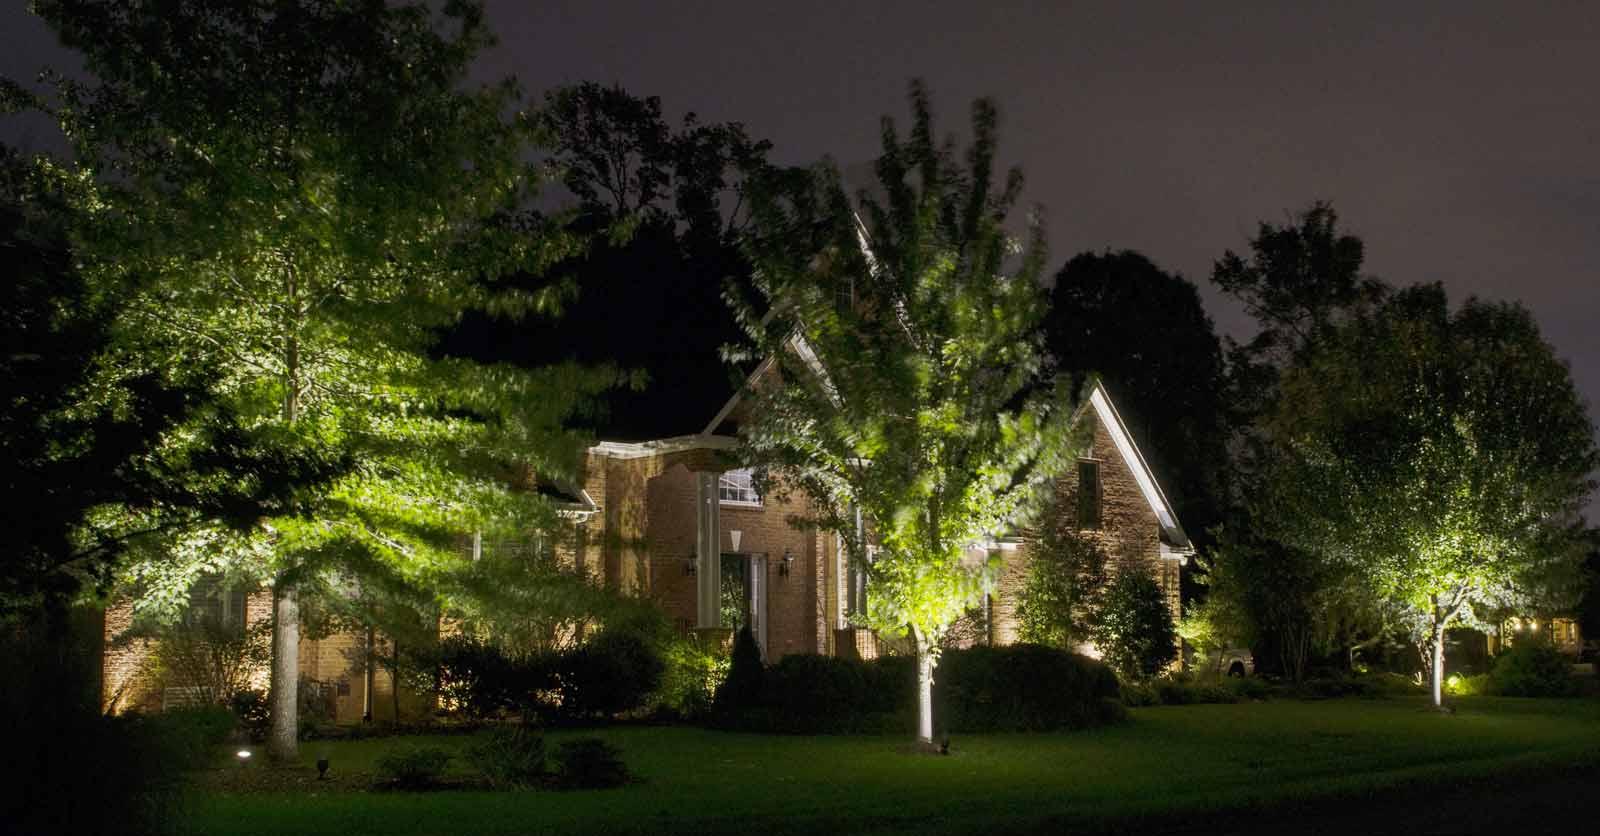 va landscape lighting contractors